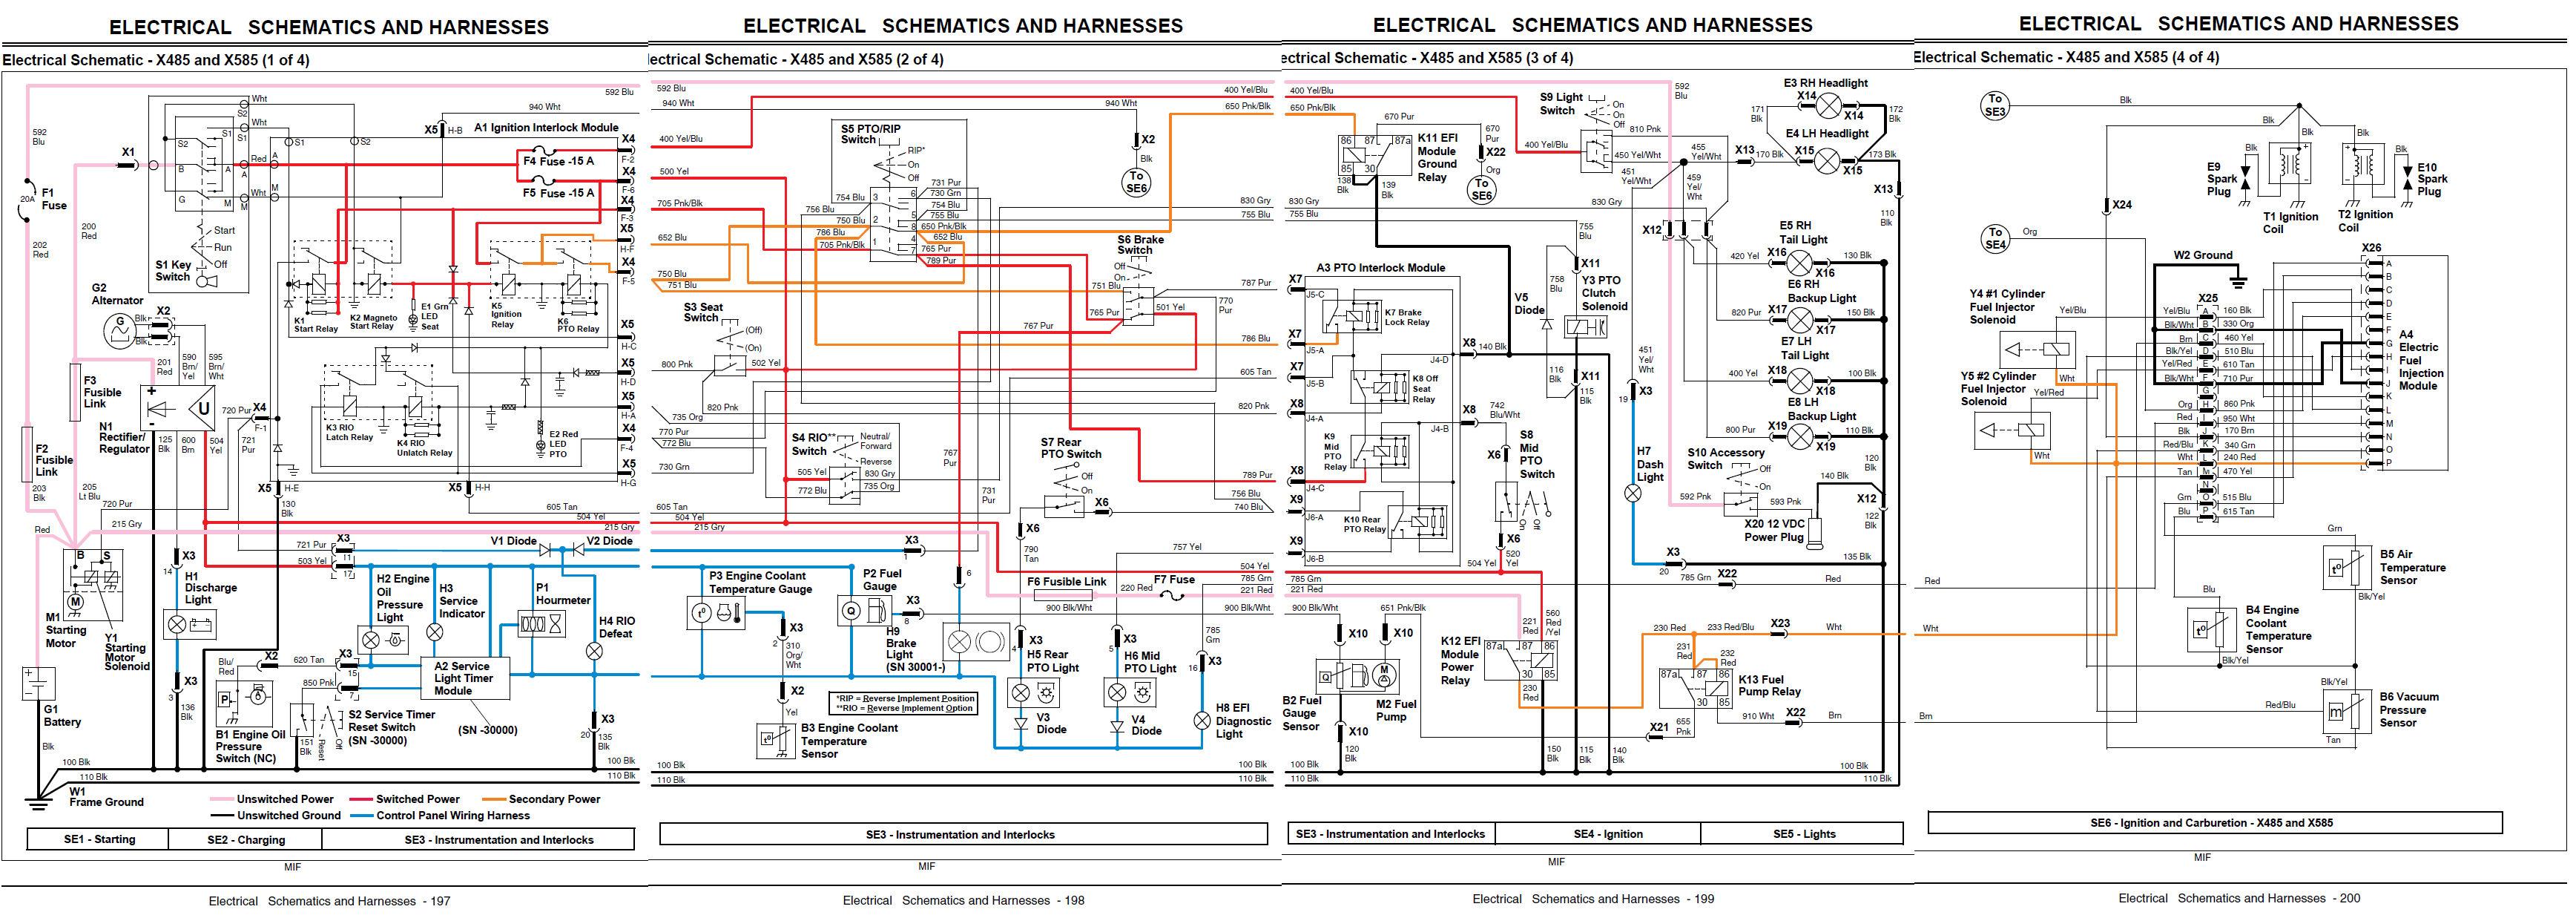 X485 Possible Overheating? Need Help | Page 2 | My Tractor Forum | X485 John Deere Wiring Diagram |  | My Tractor Forum